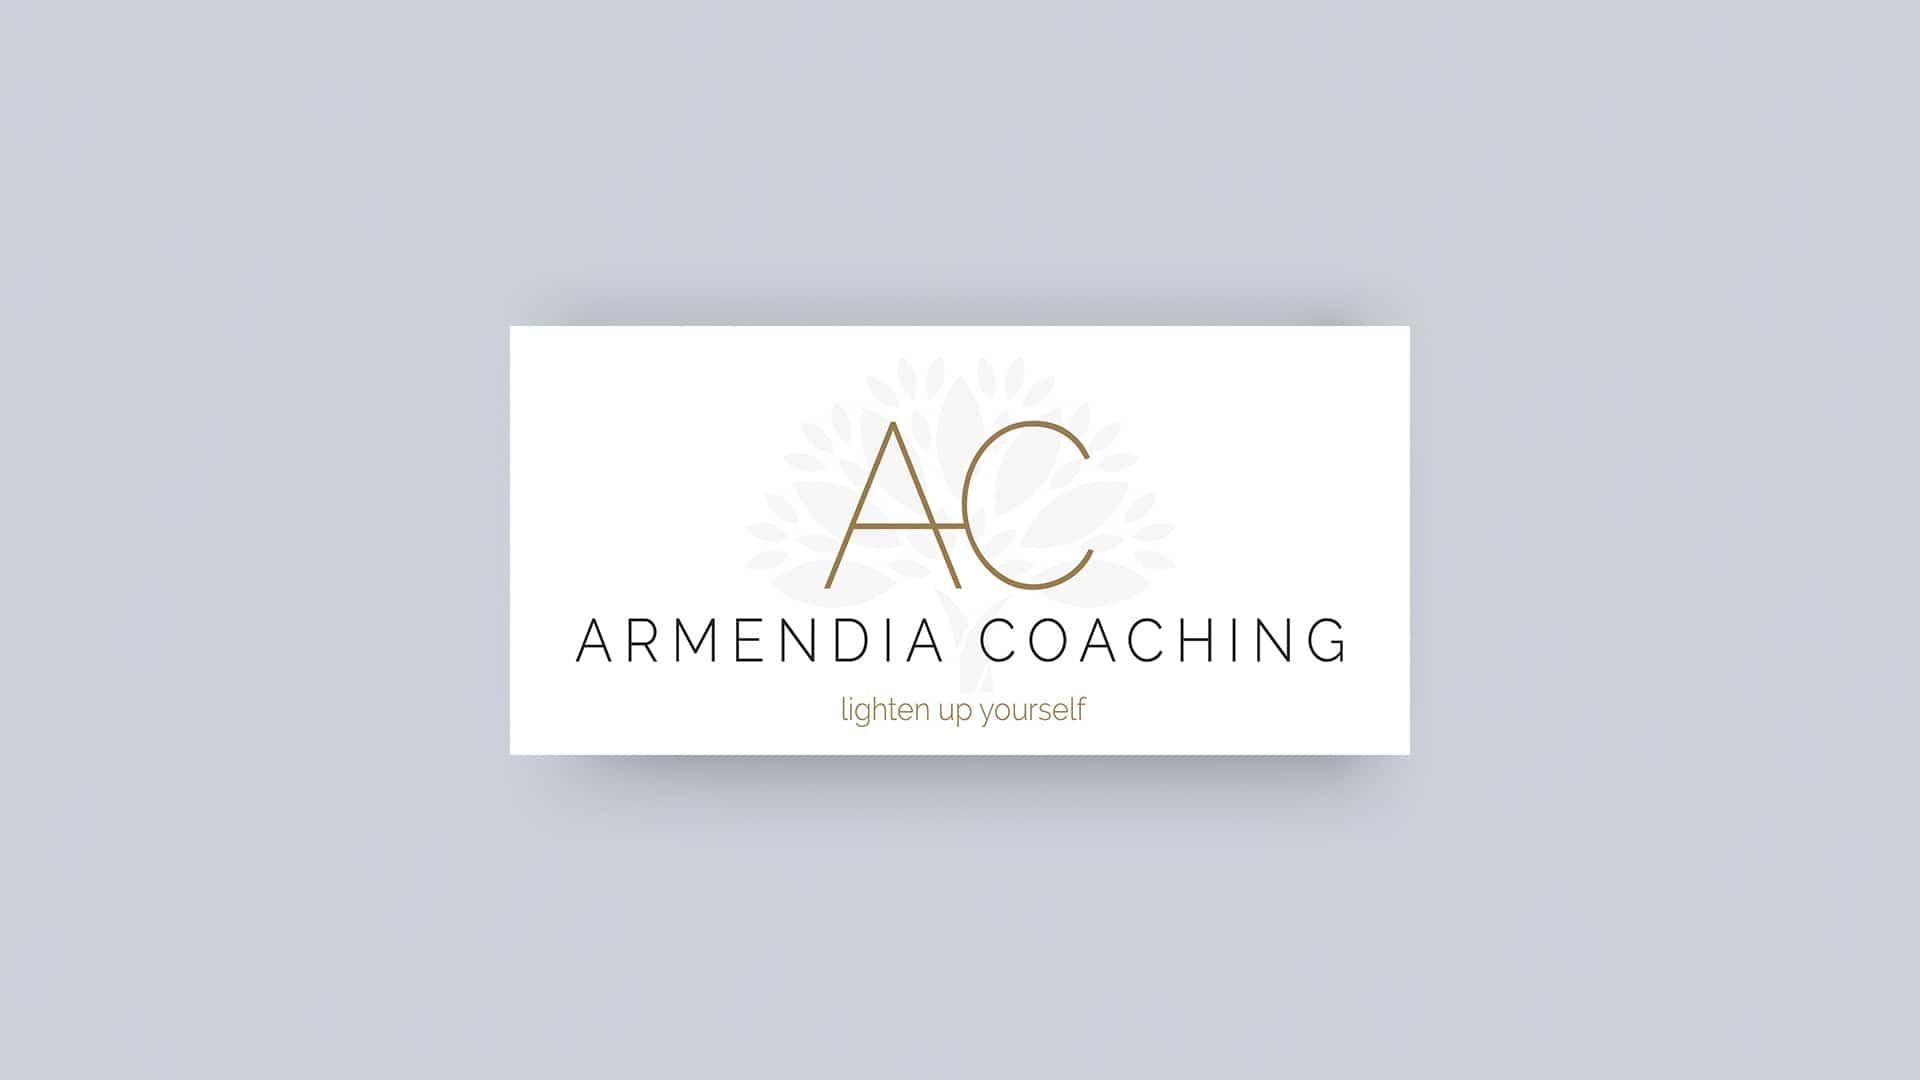 armendia-coaching-logo